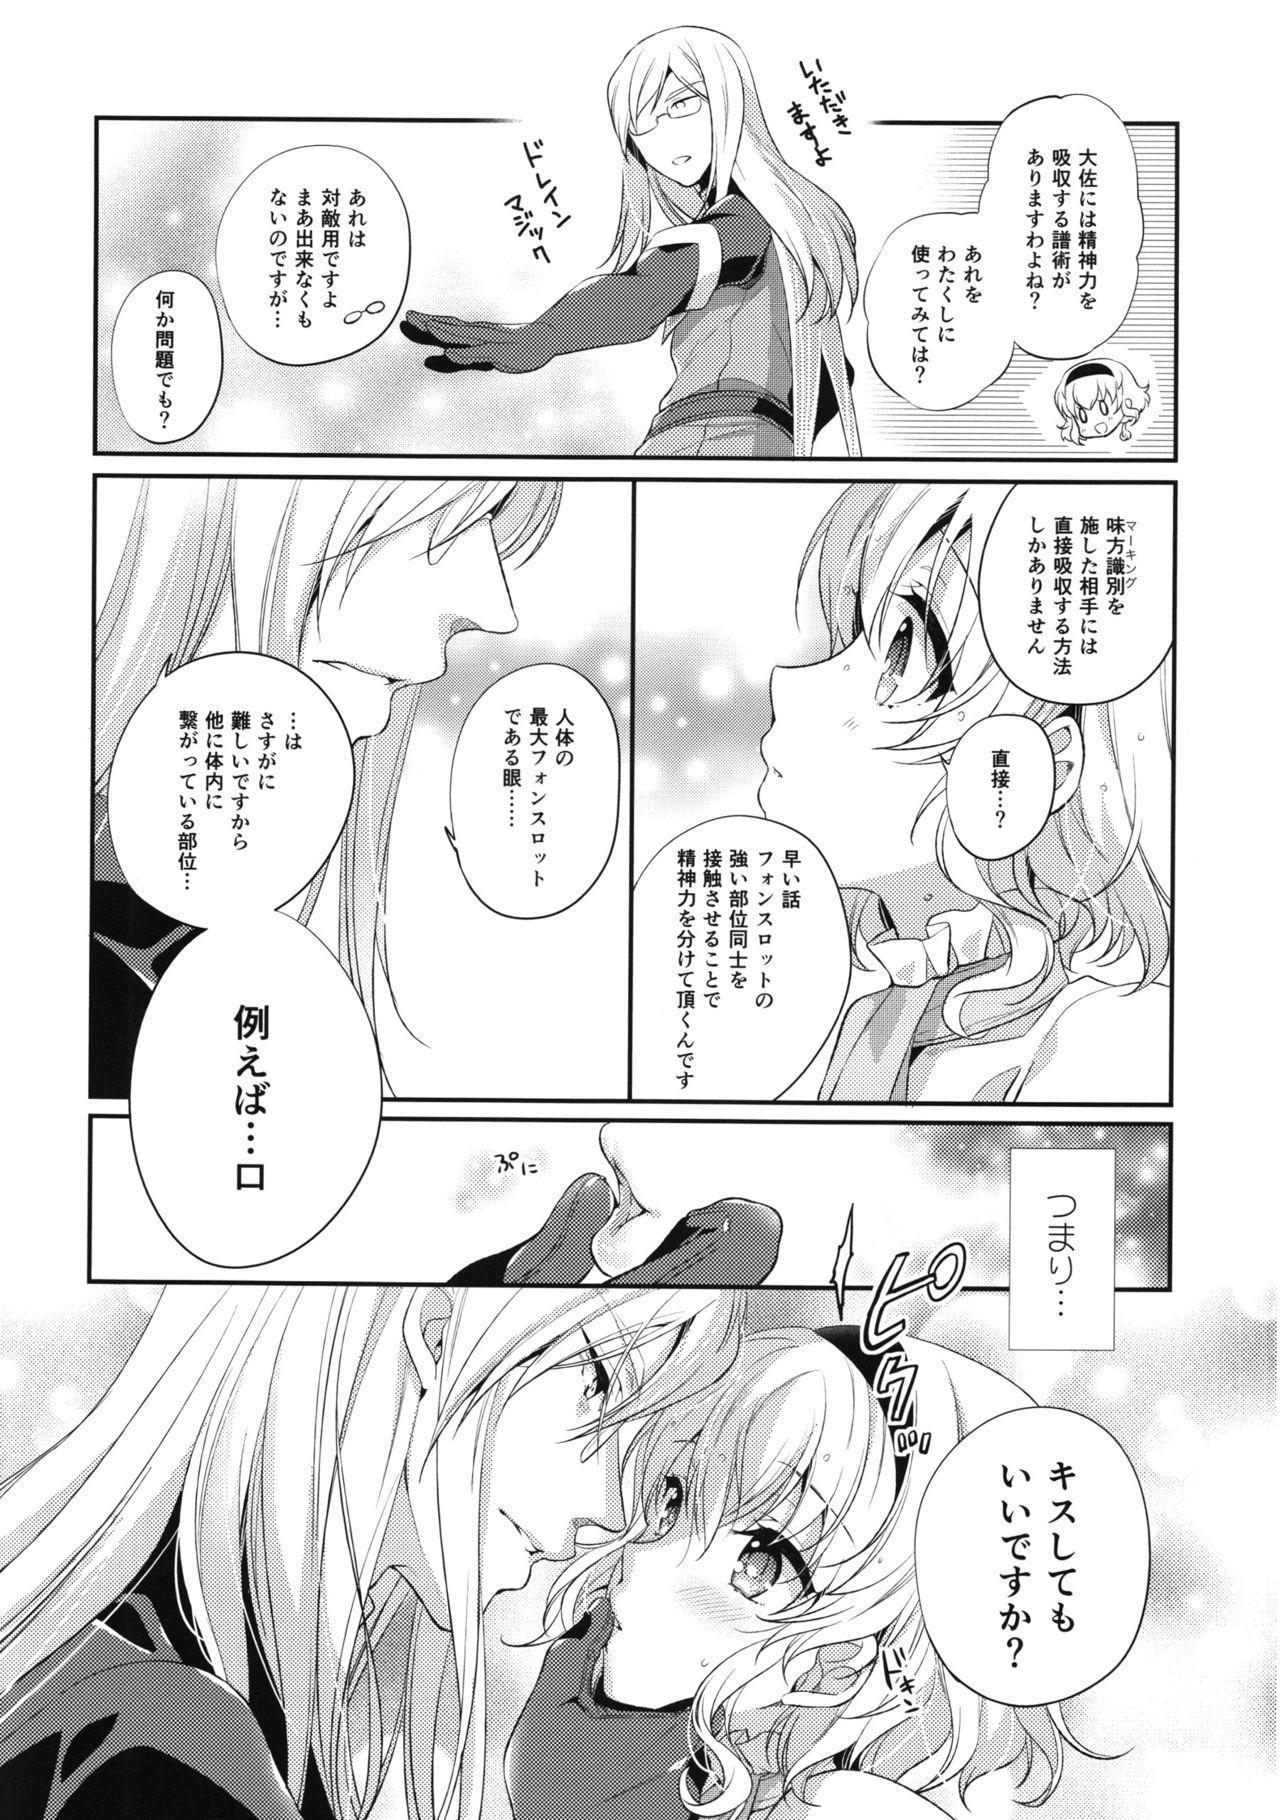 Itadakimasuyo. 6